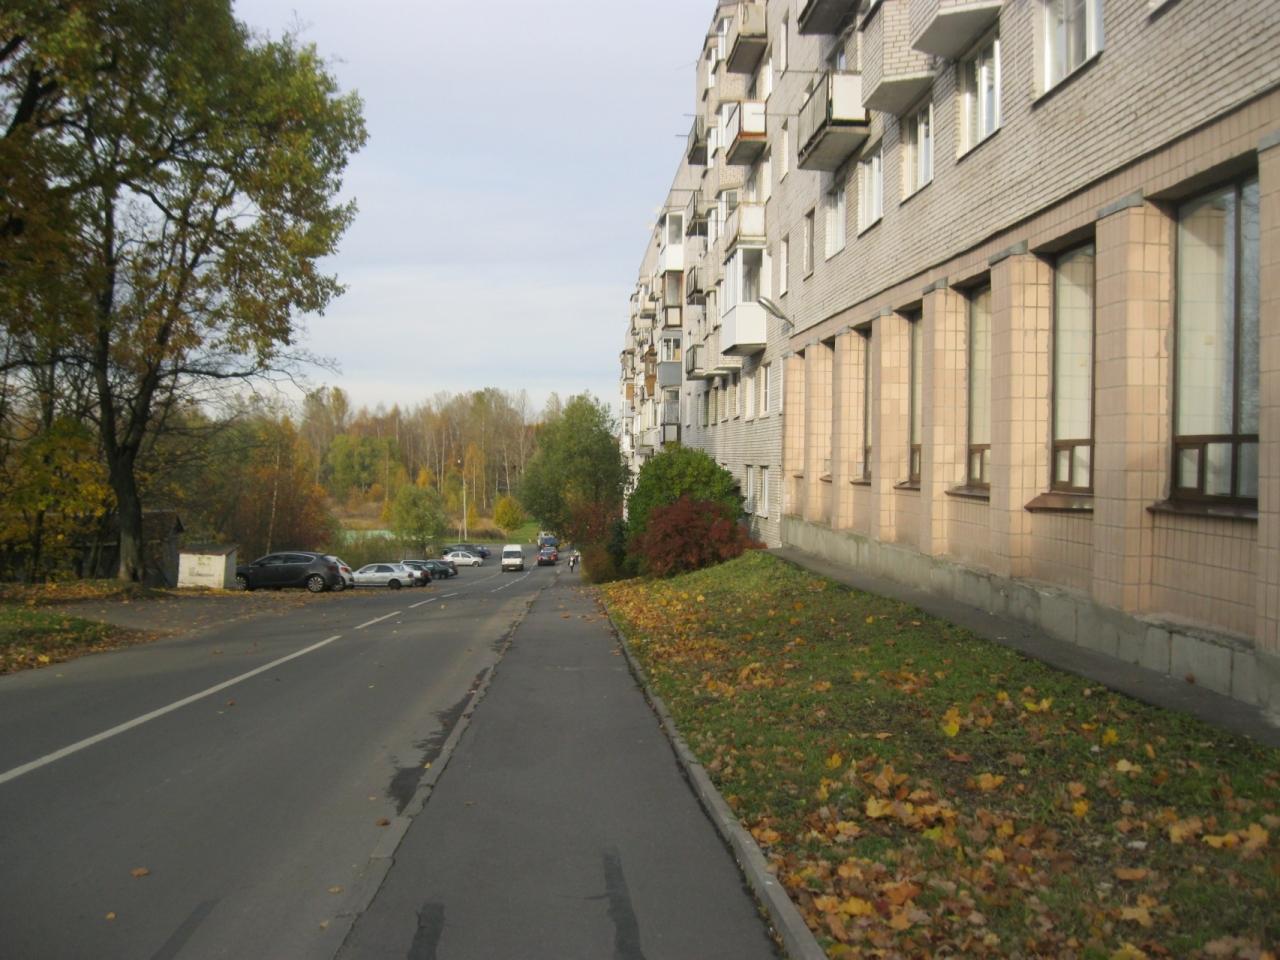 http://arendaspb24.pro.bkn.ru/images/s_big/32581e28-fde9-11e7-b300-448a5bd44c07.jpg